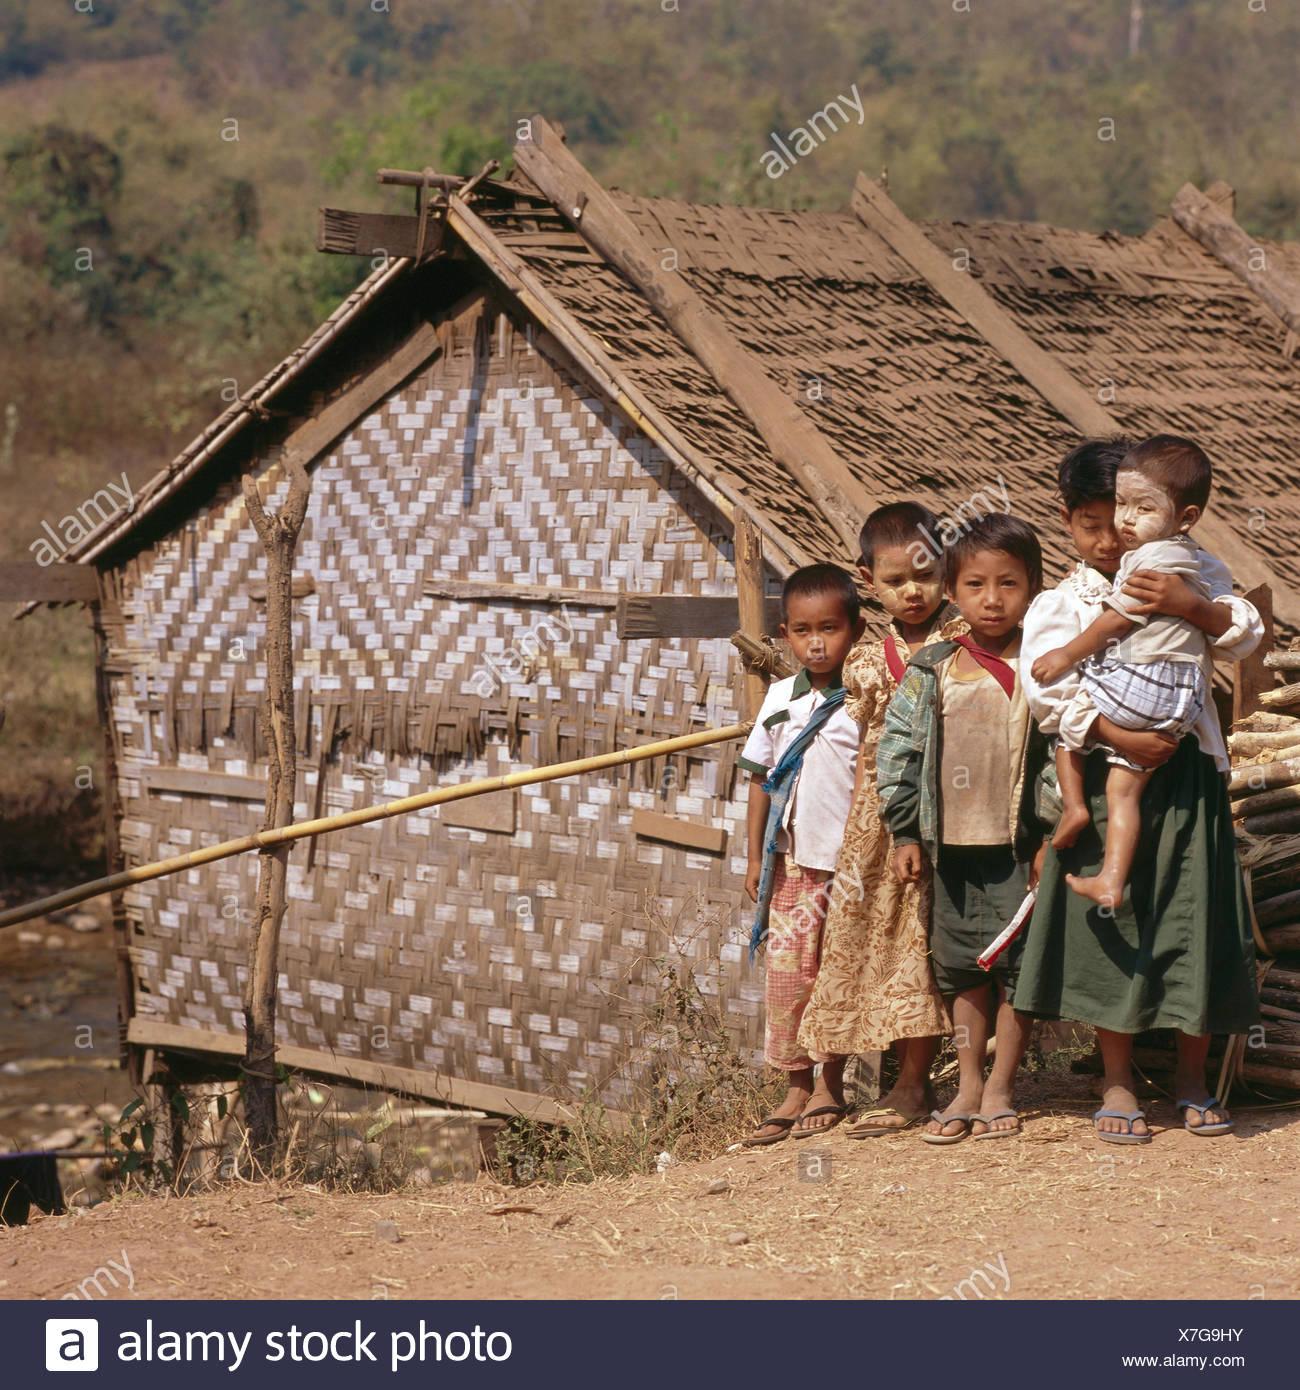 Myanmar, Kalaw, hut, children, group picture, no model